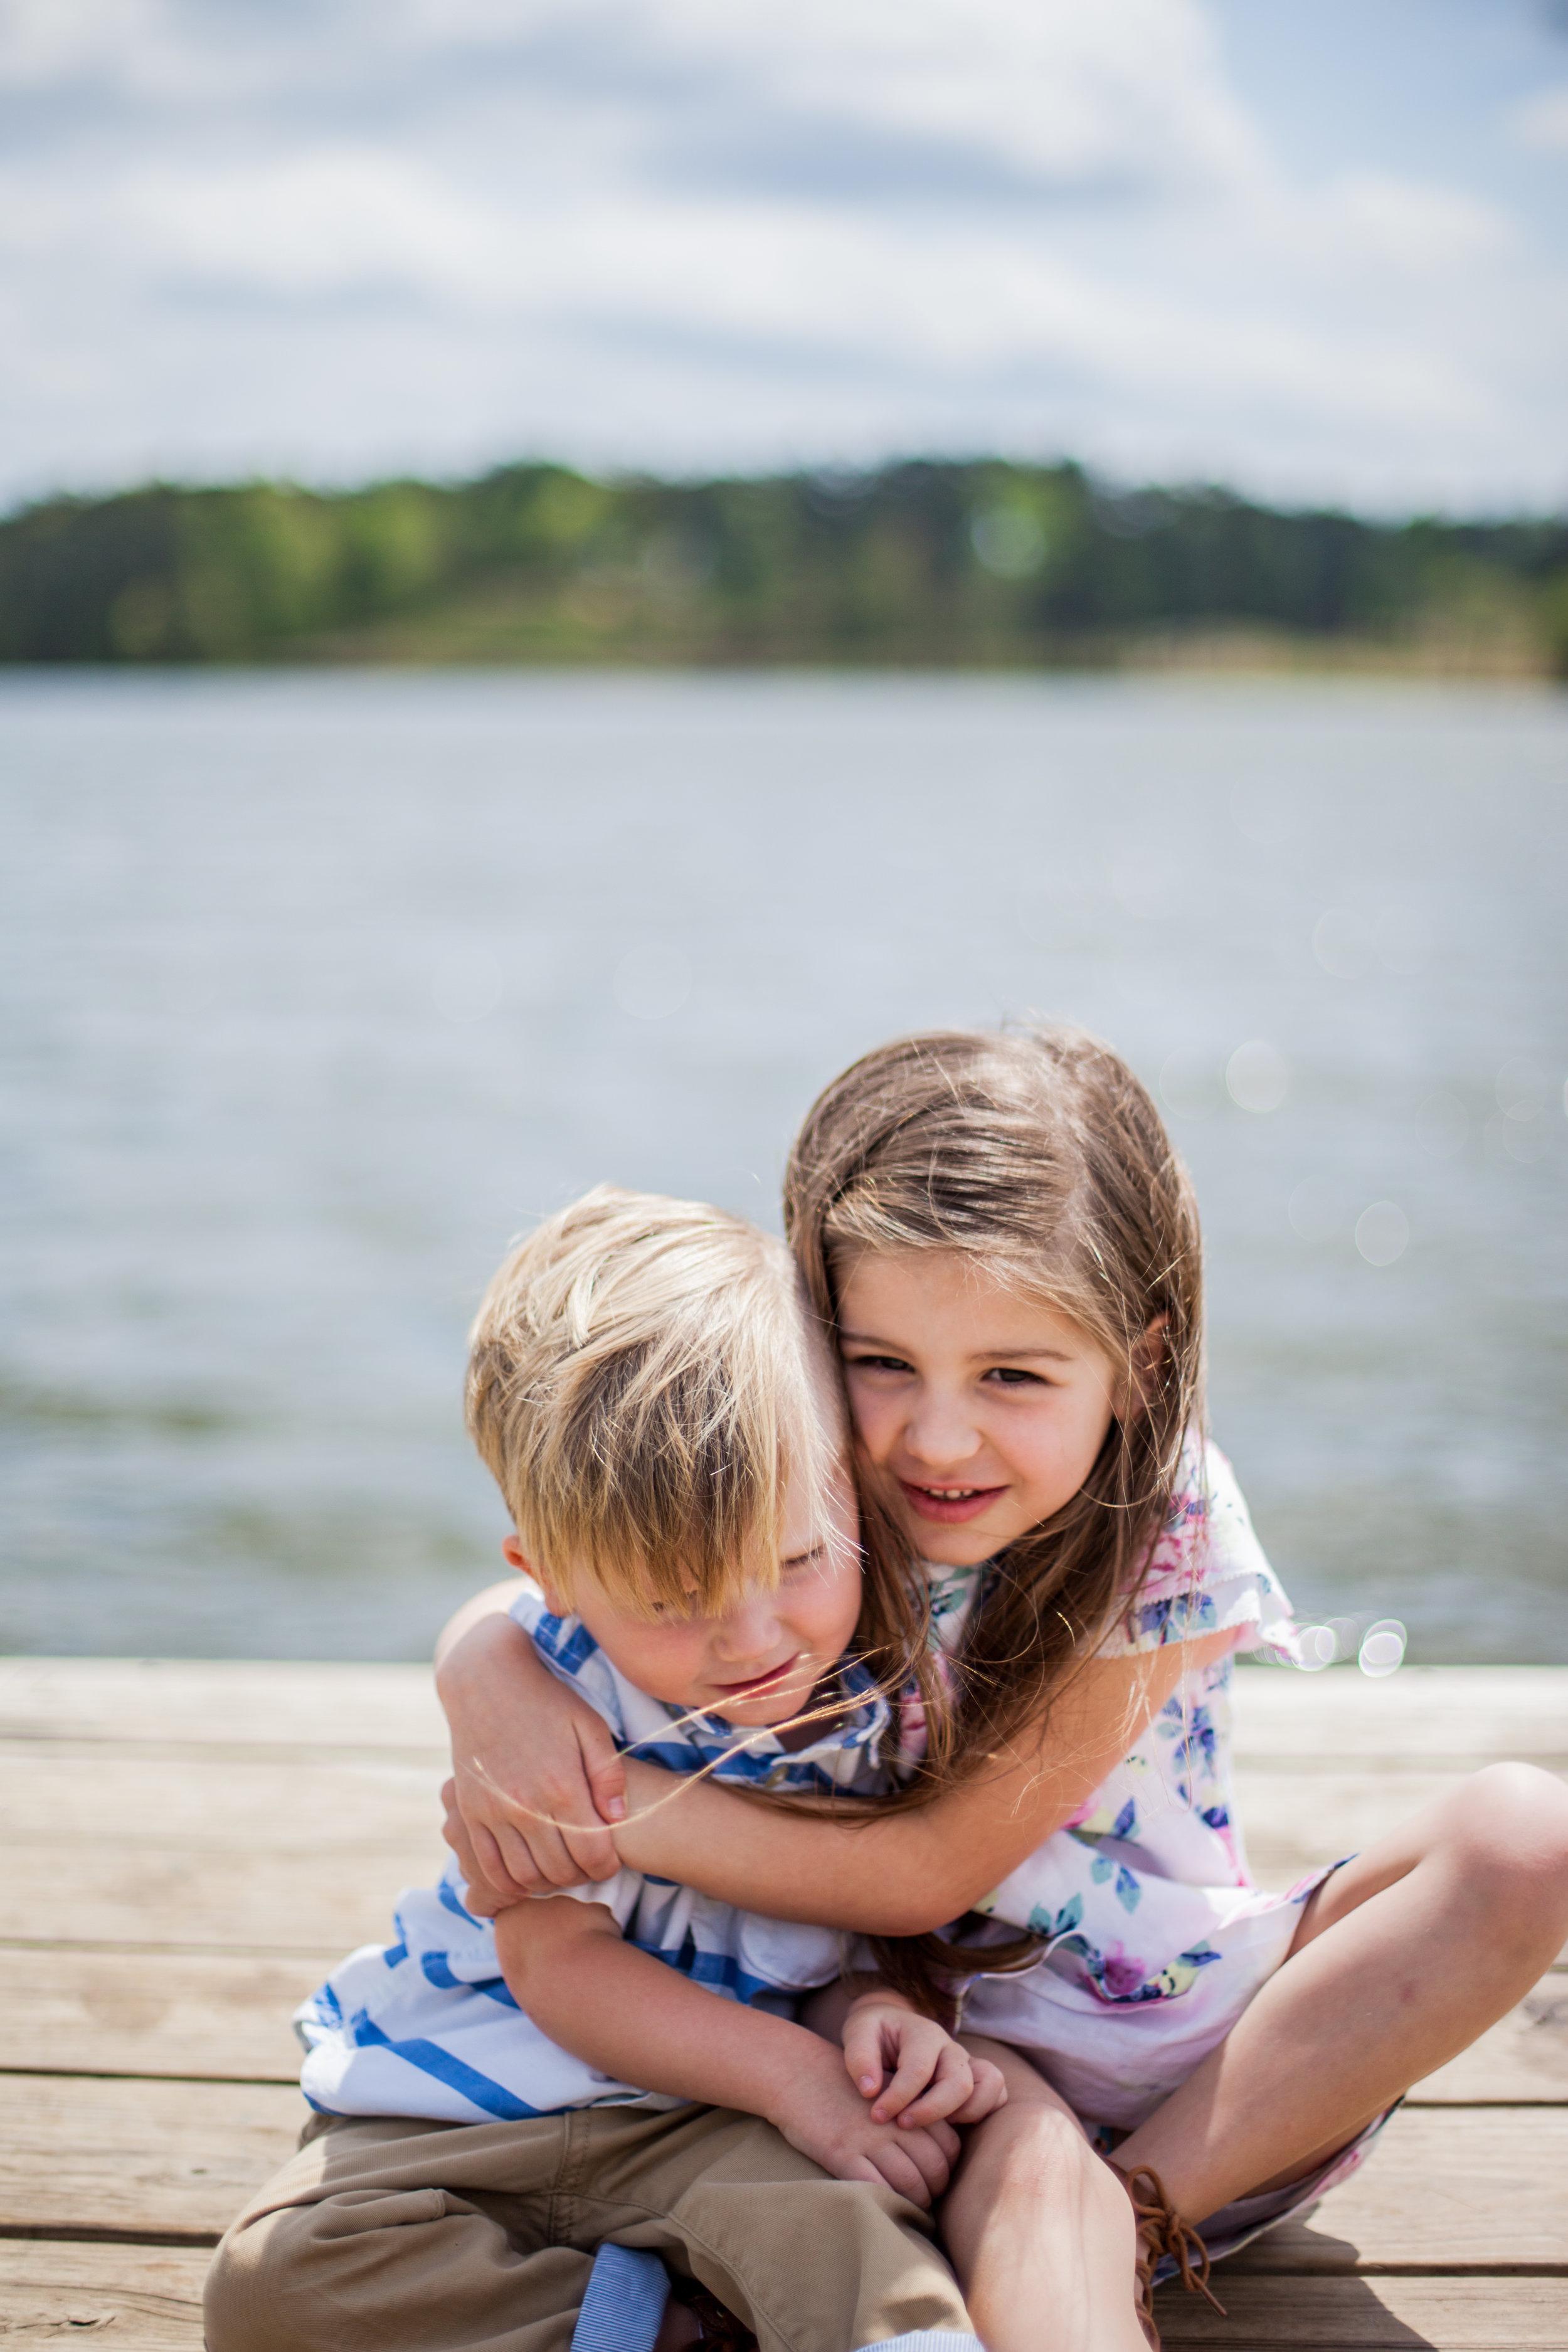 woodstock-family-photography-mini-session-acworth-beach-15.jpg